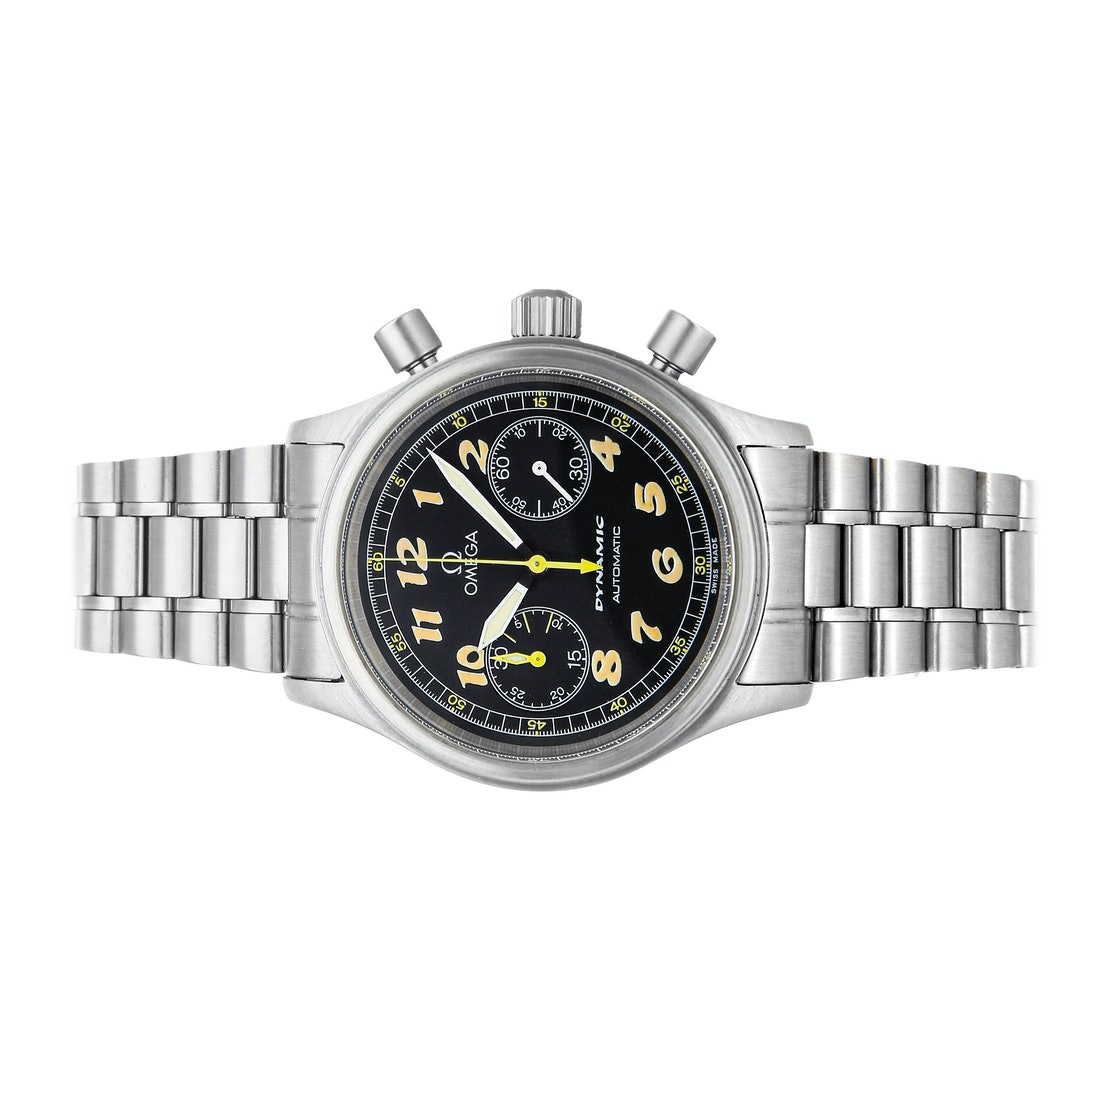 Omega Vintage Dynamic Chronograph III 5240.50.00